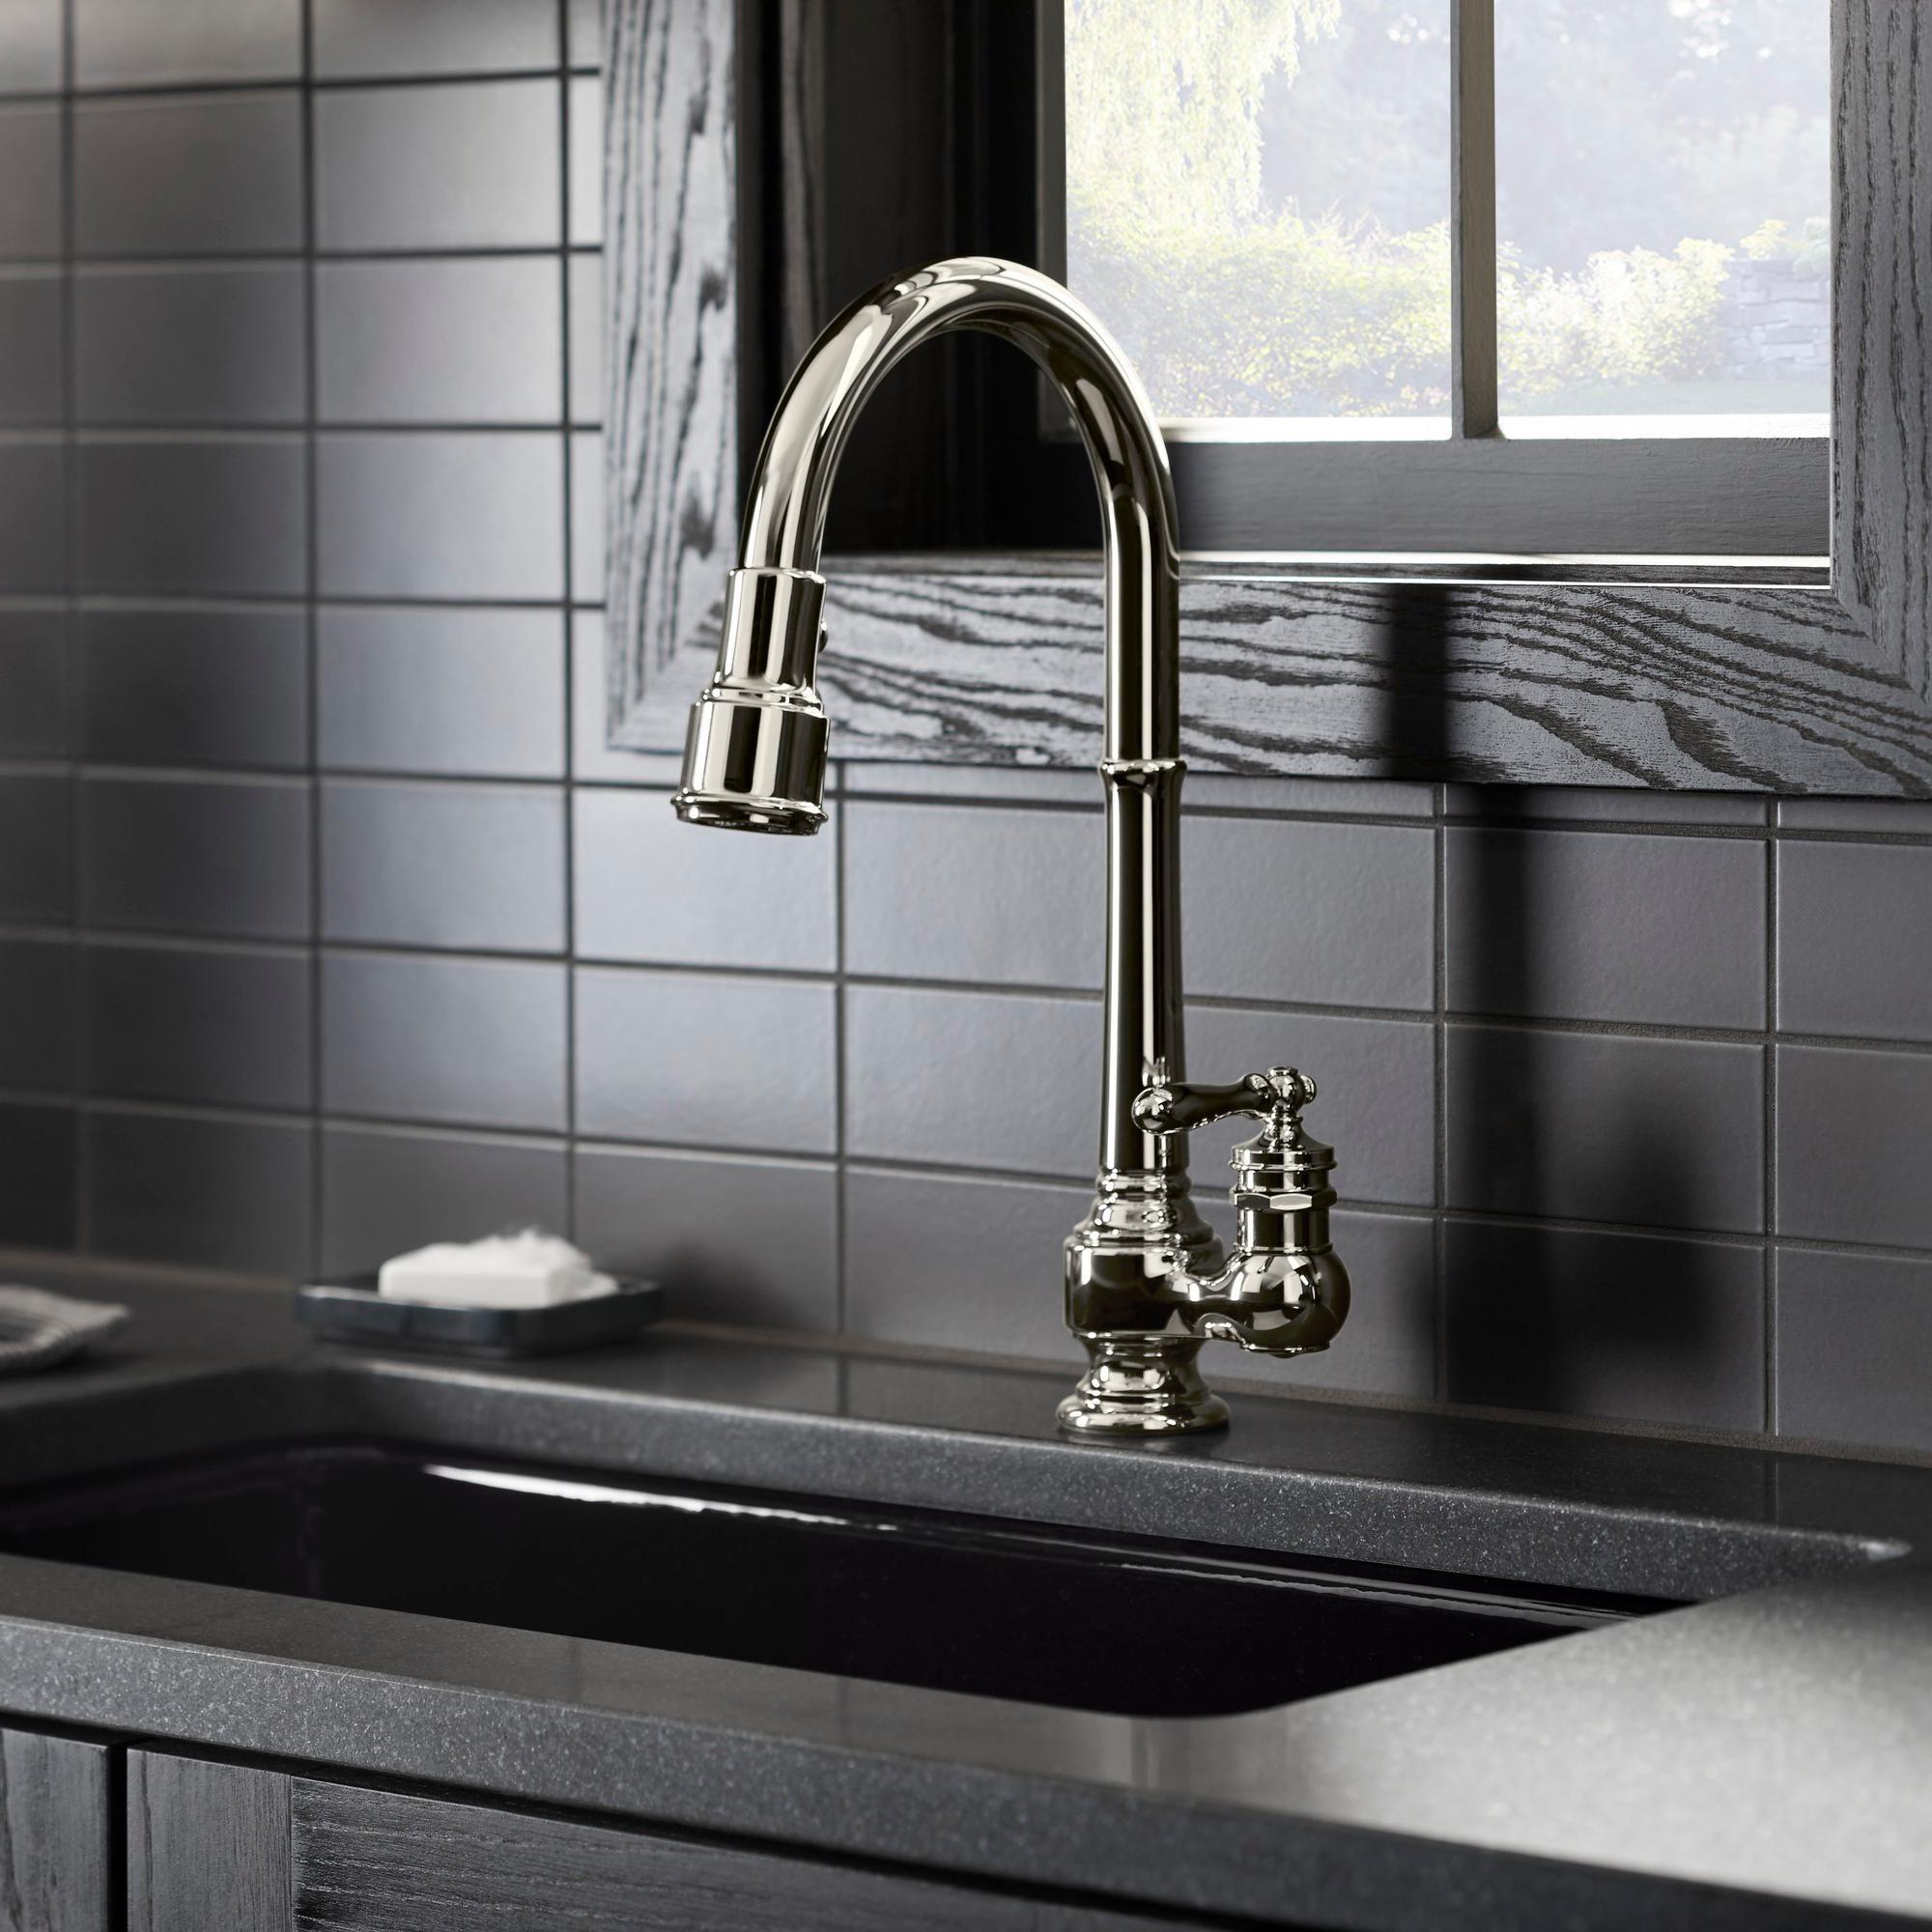 KOHLER K-99261-CP Artifacts Single-Hole Kitchen Sink Faucet ...